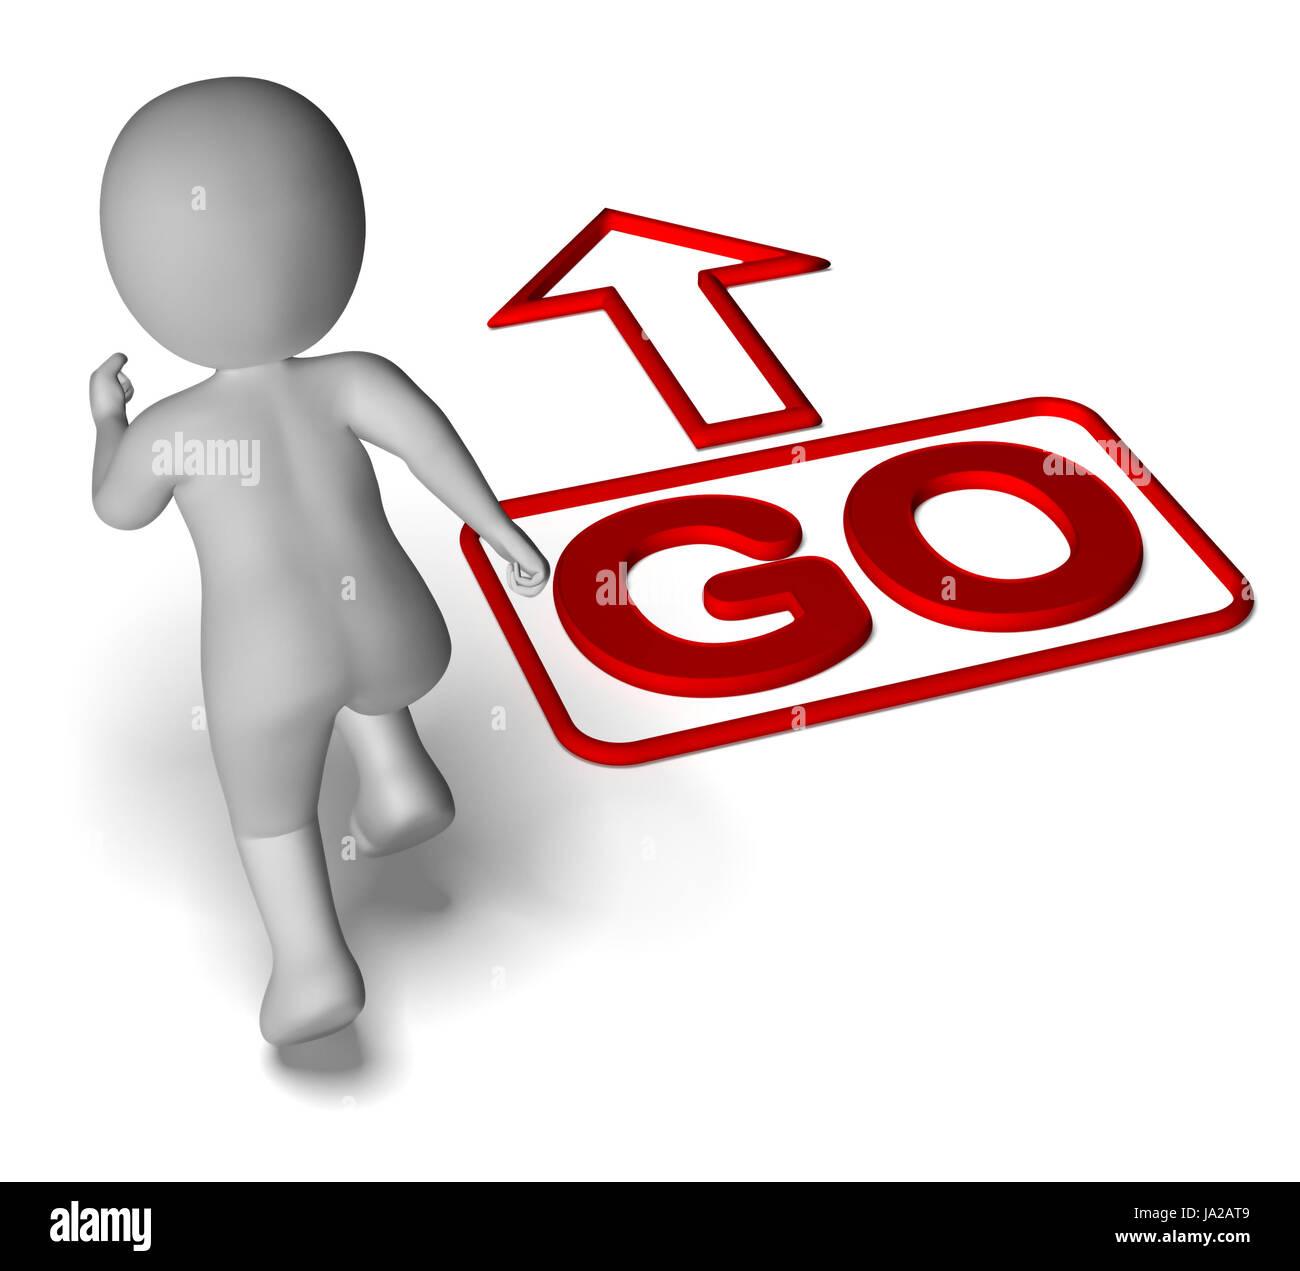 walk, go, going, walking, start, begin, urgency, starting, beginning, run, Stock Photo